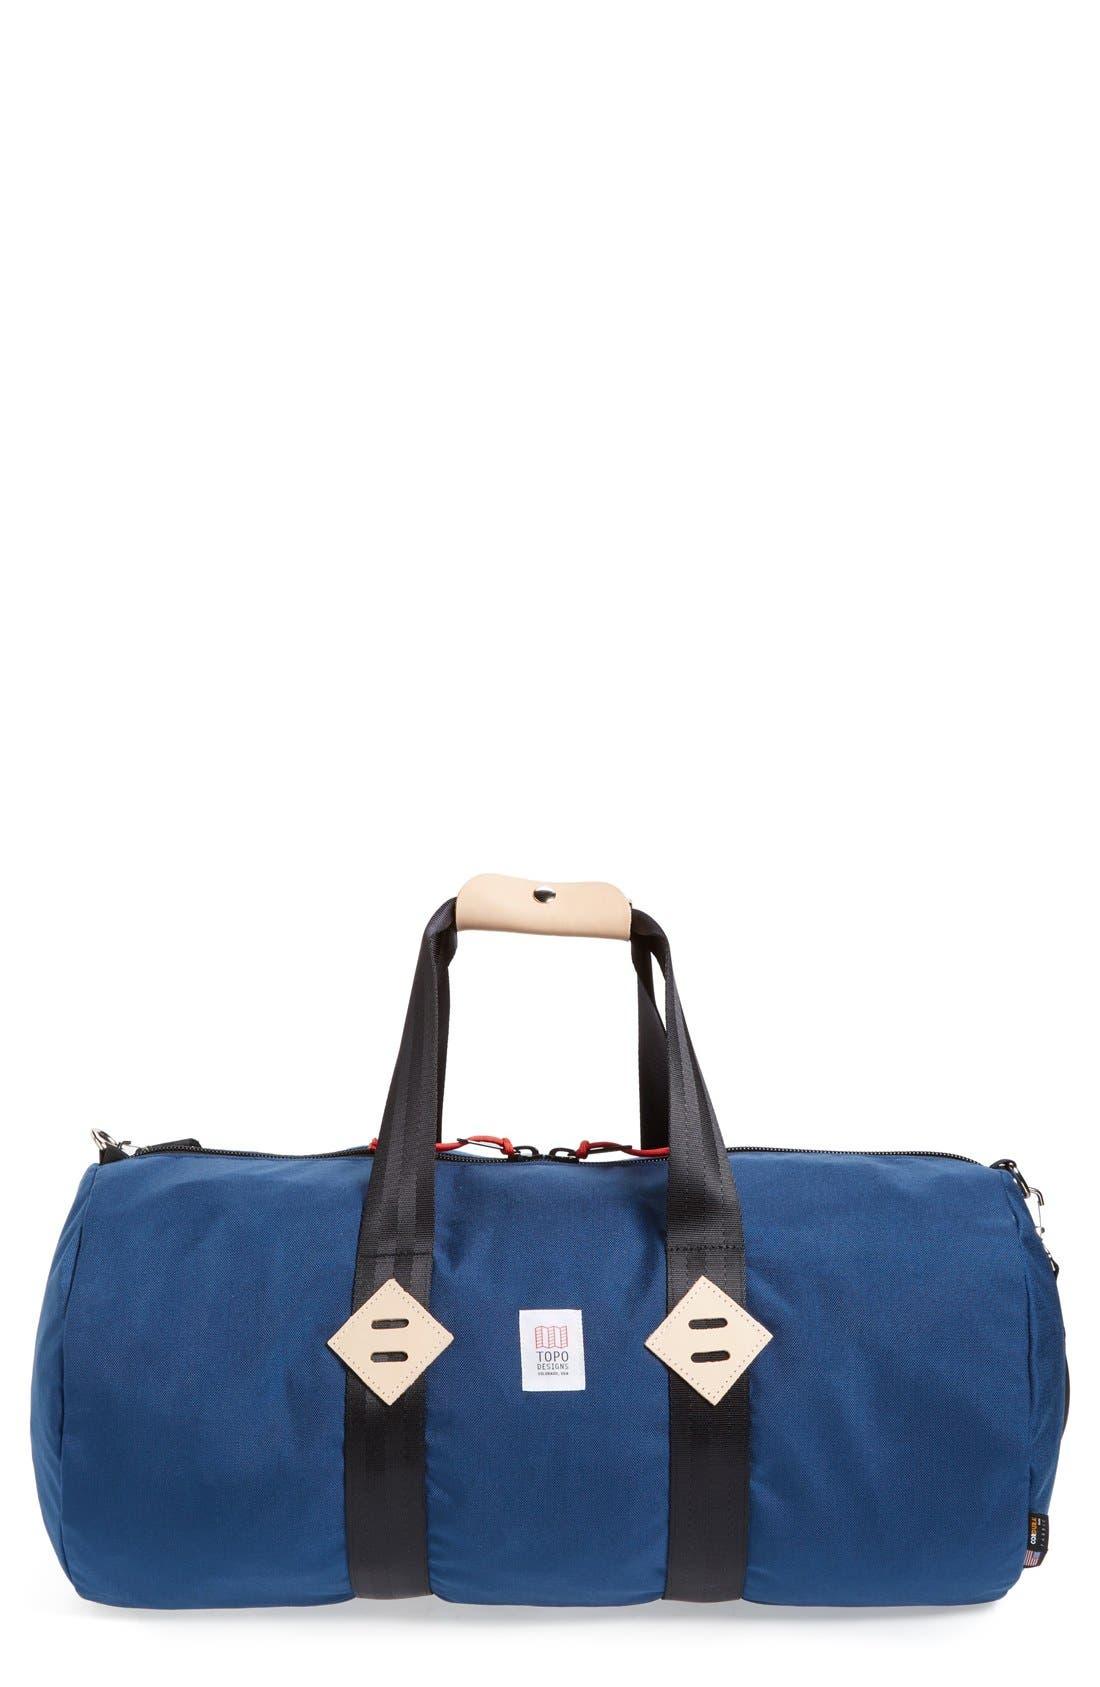 Classic Duffel Bag,                             Main thumbnail 1, color,                             Navy